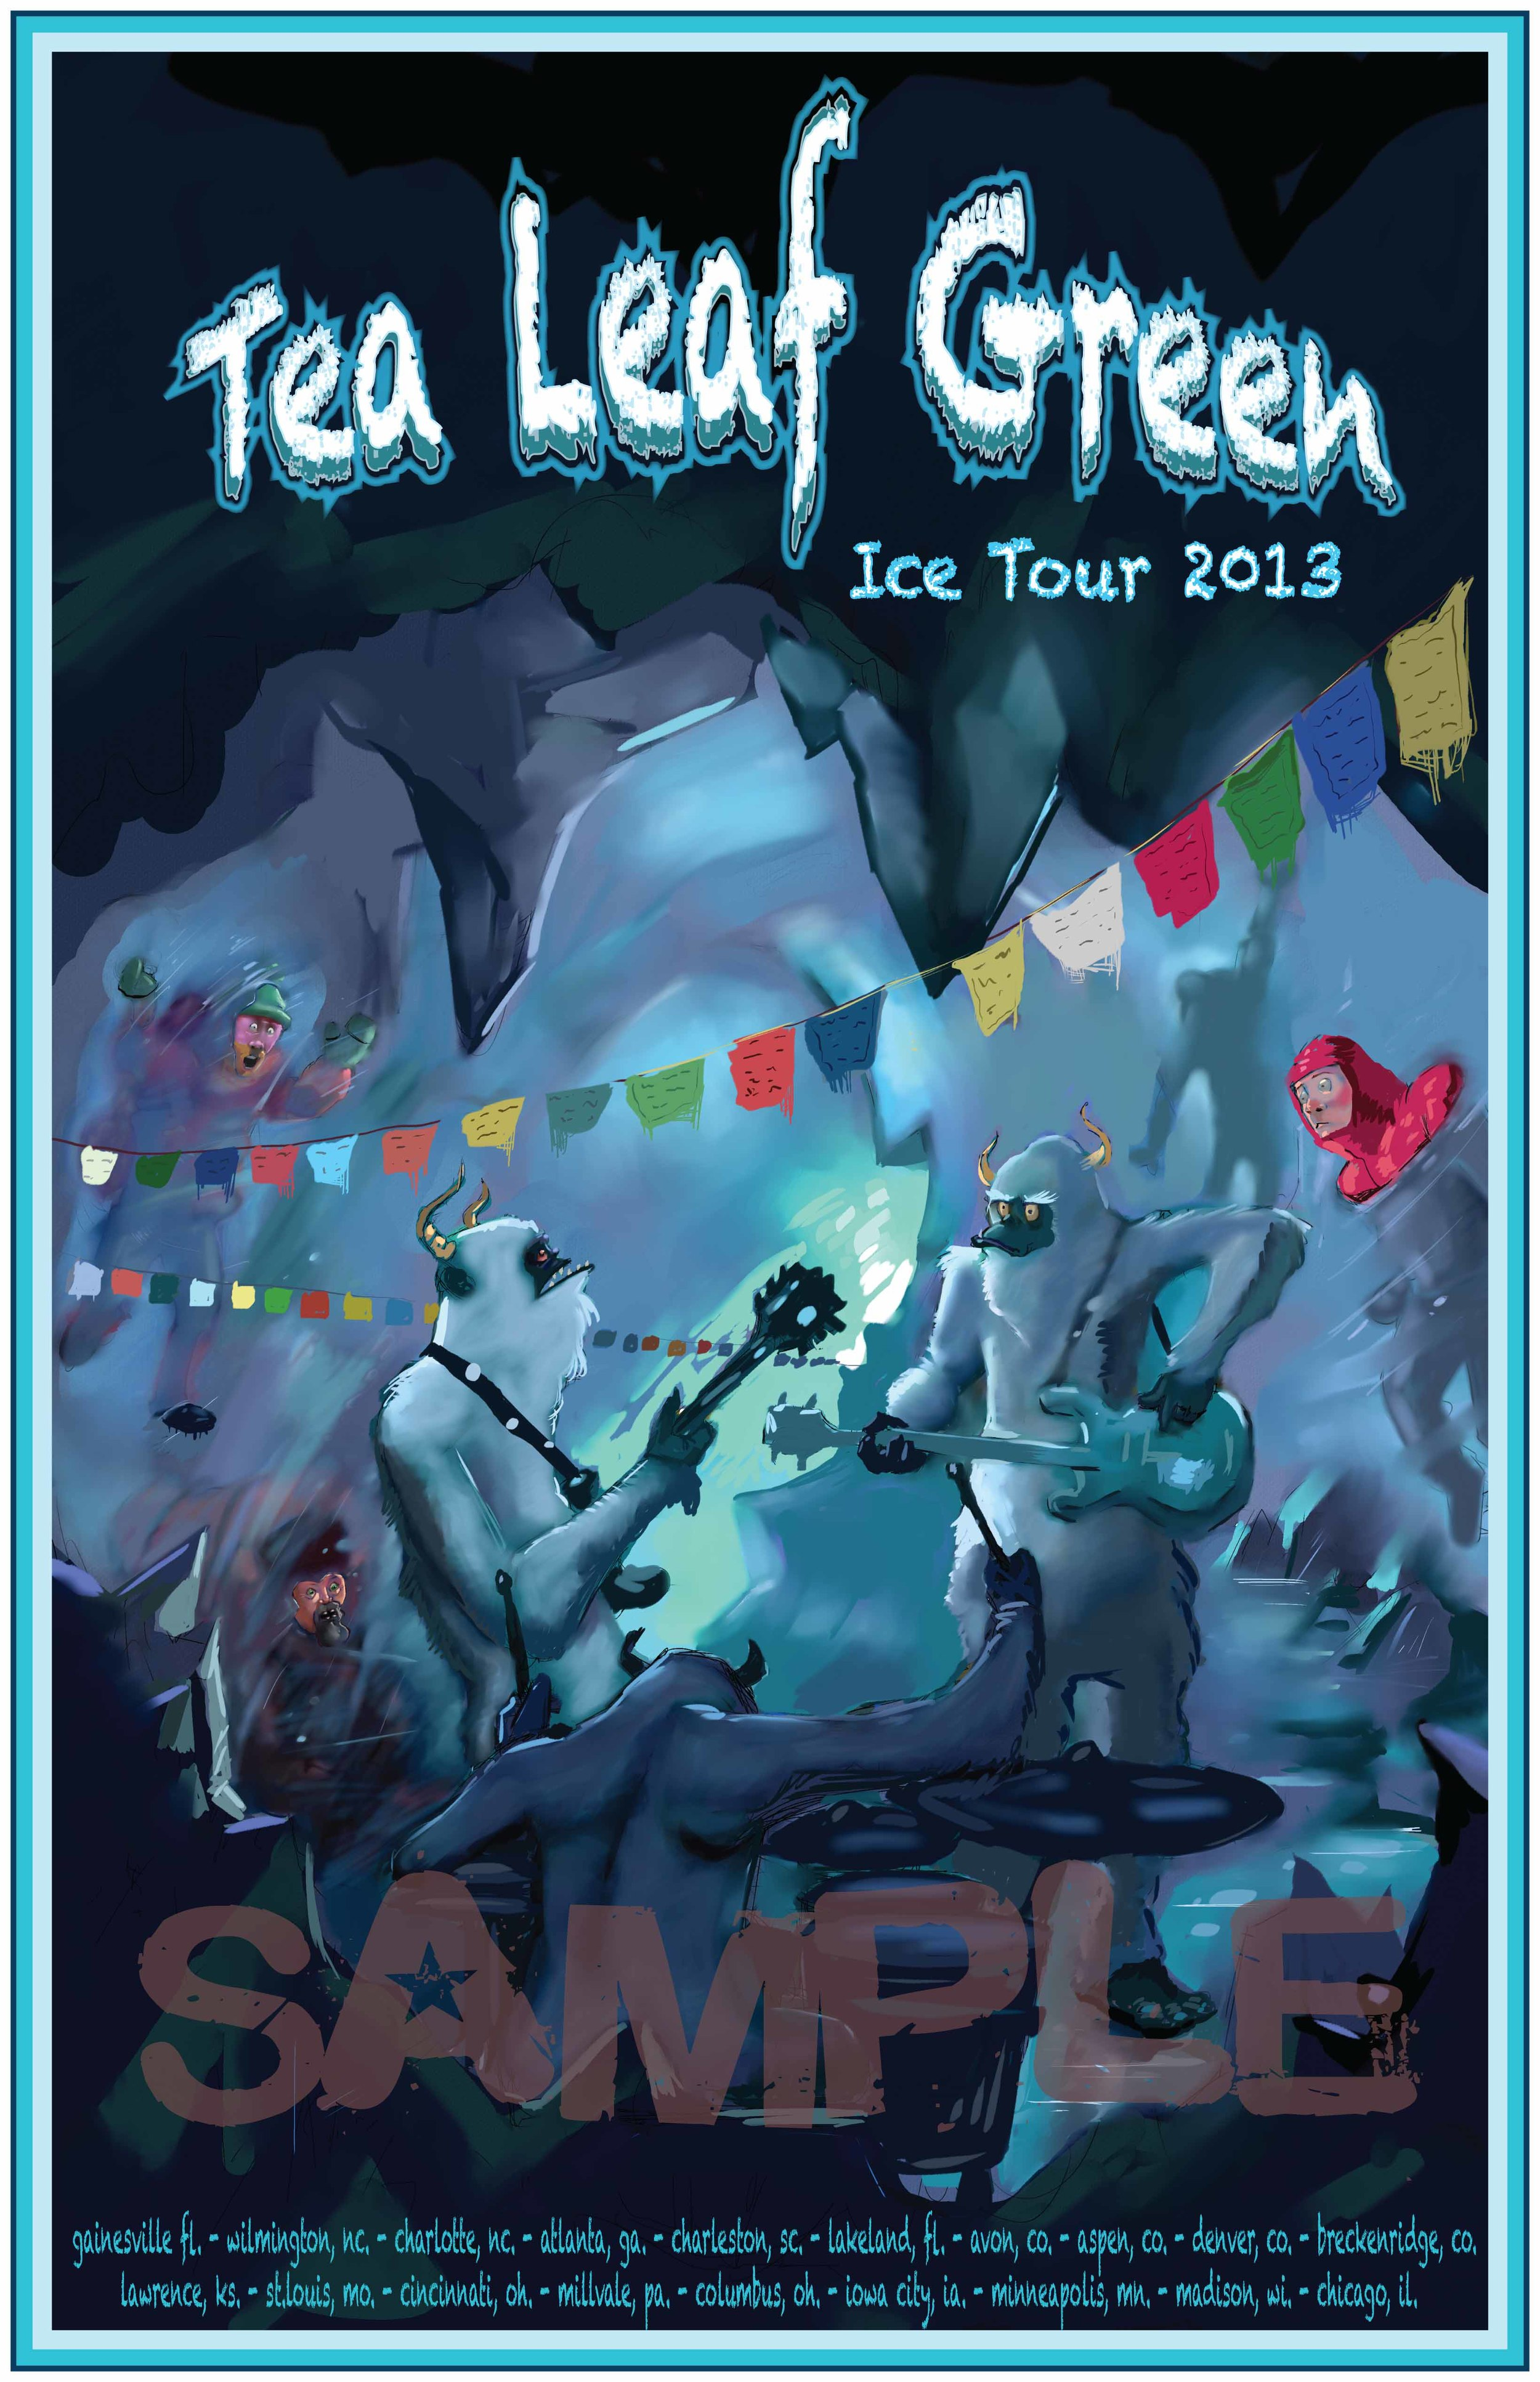 tlg ice toor preview.jpg